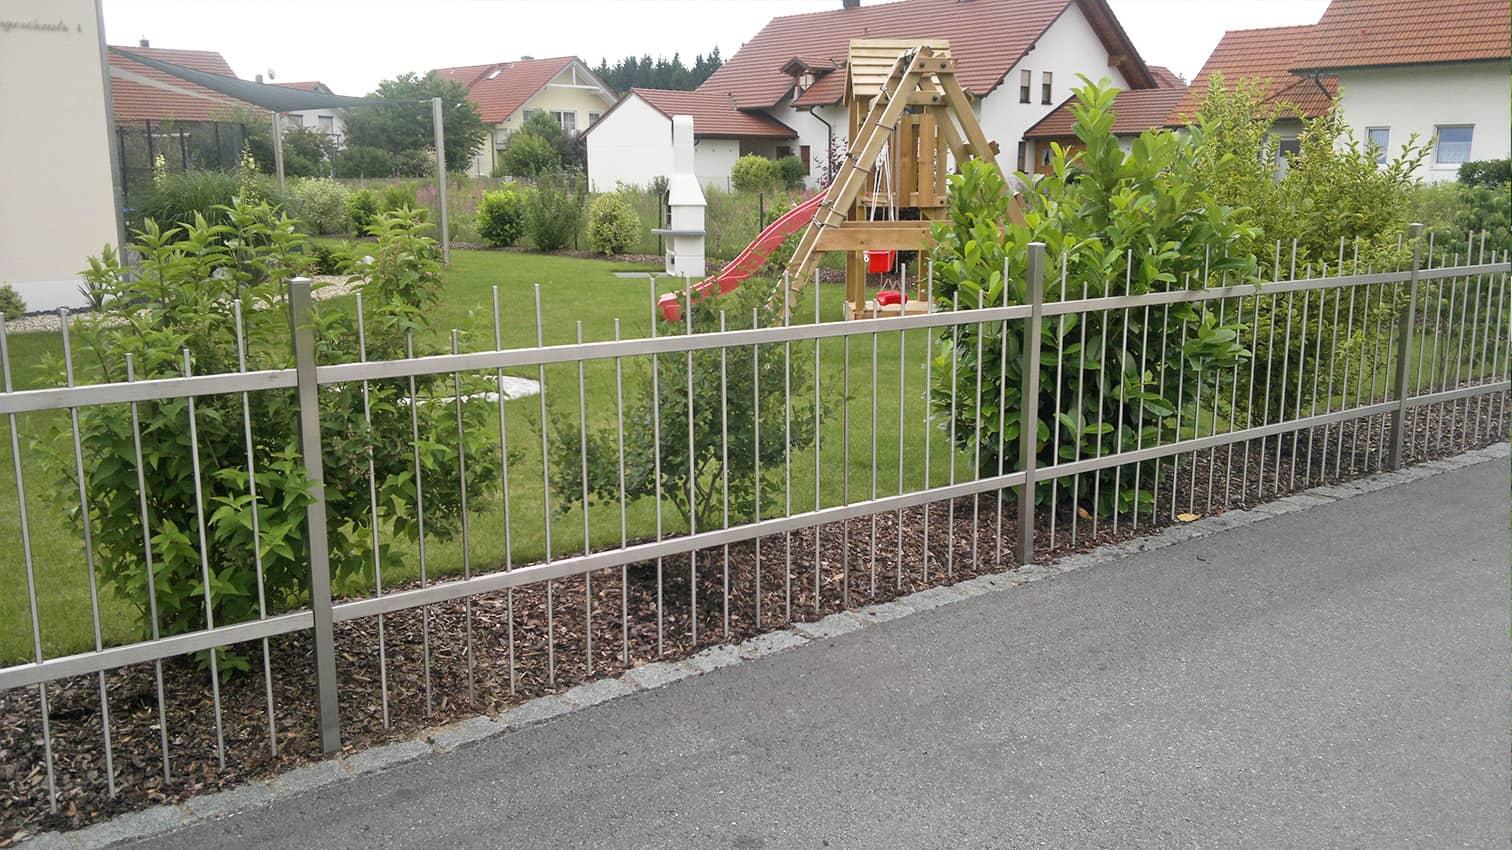 Grundstückszaun aus Edelstahl